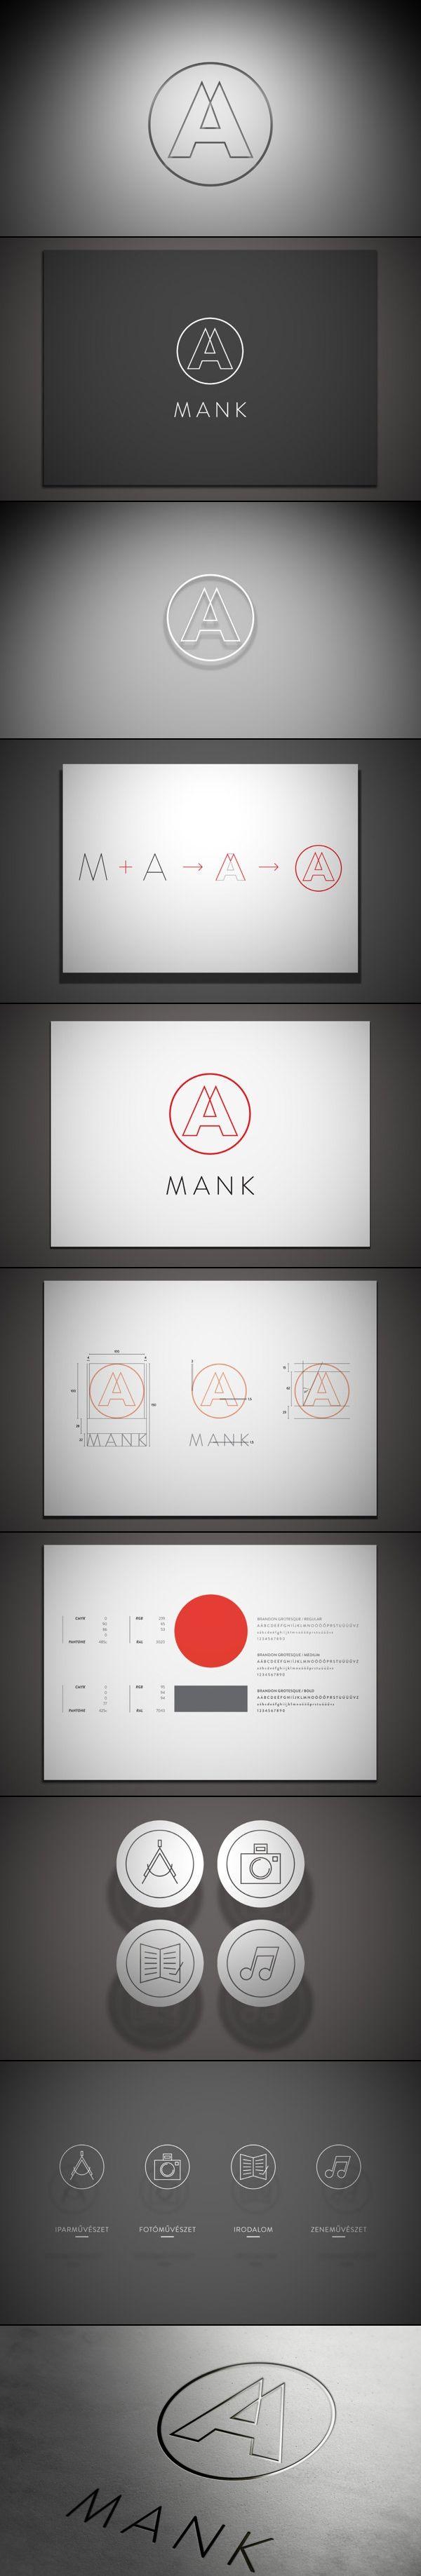 Mank Brand Identity.